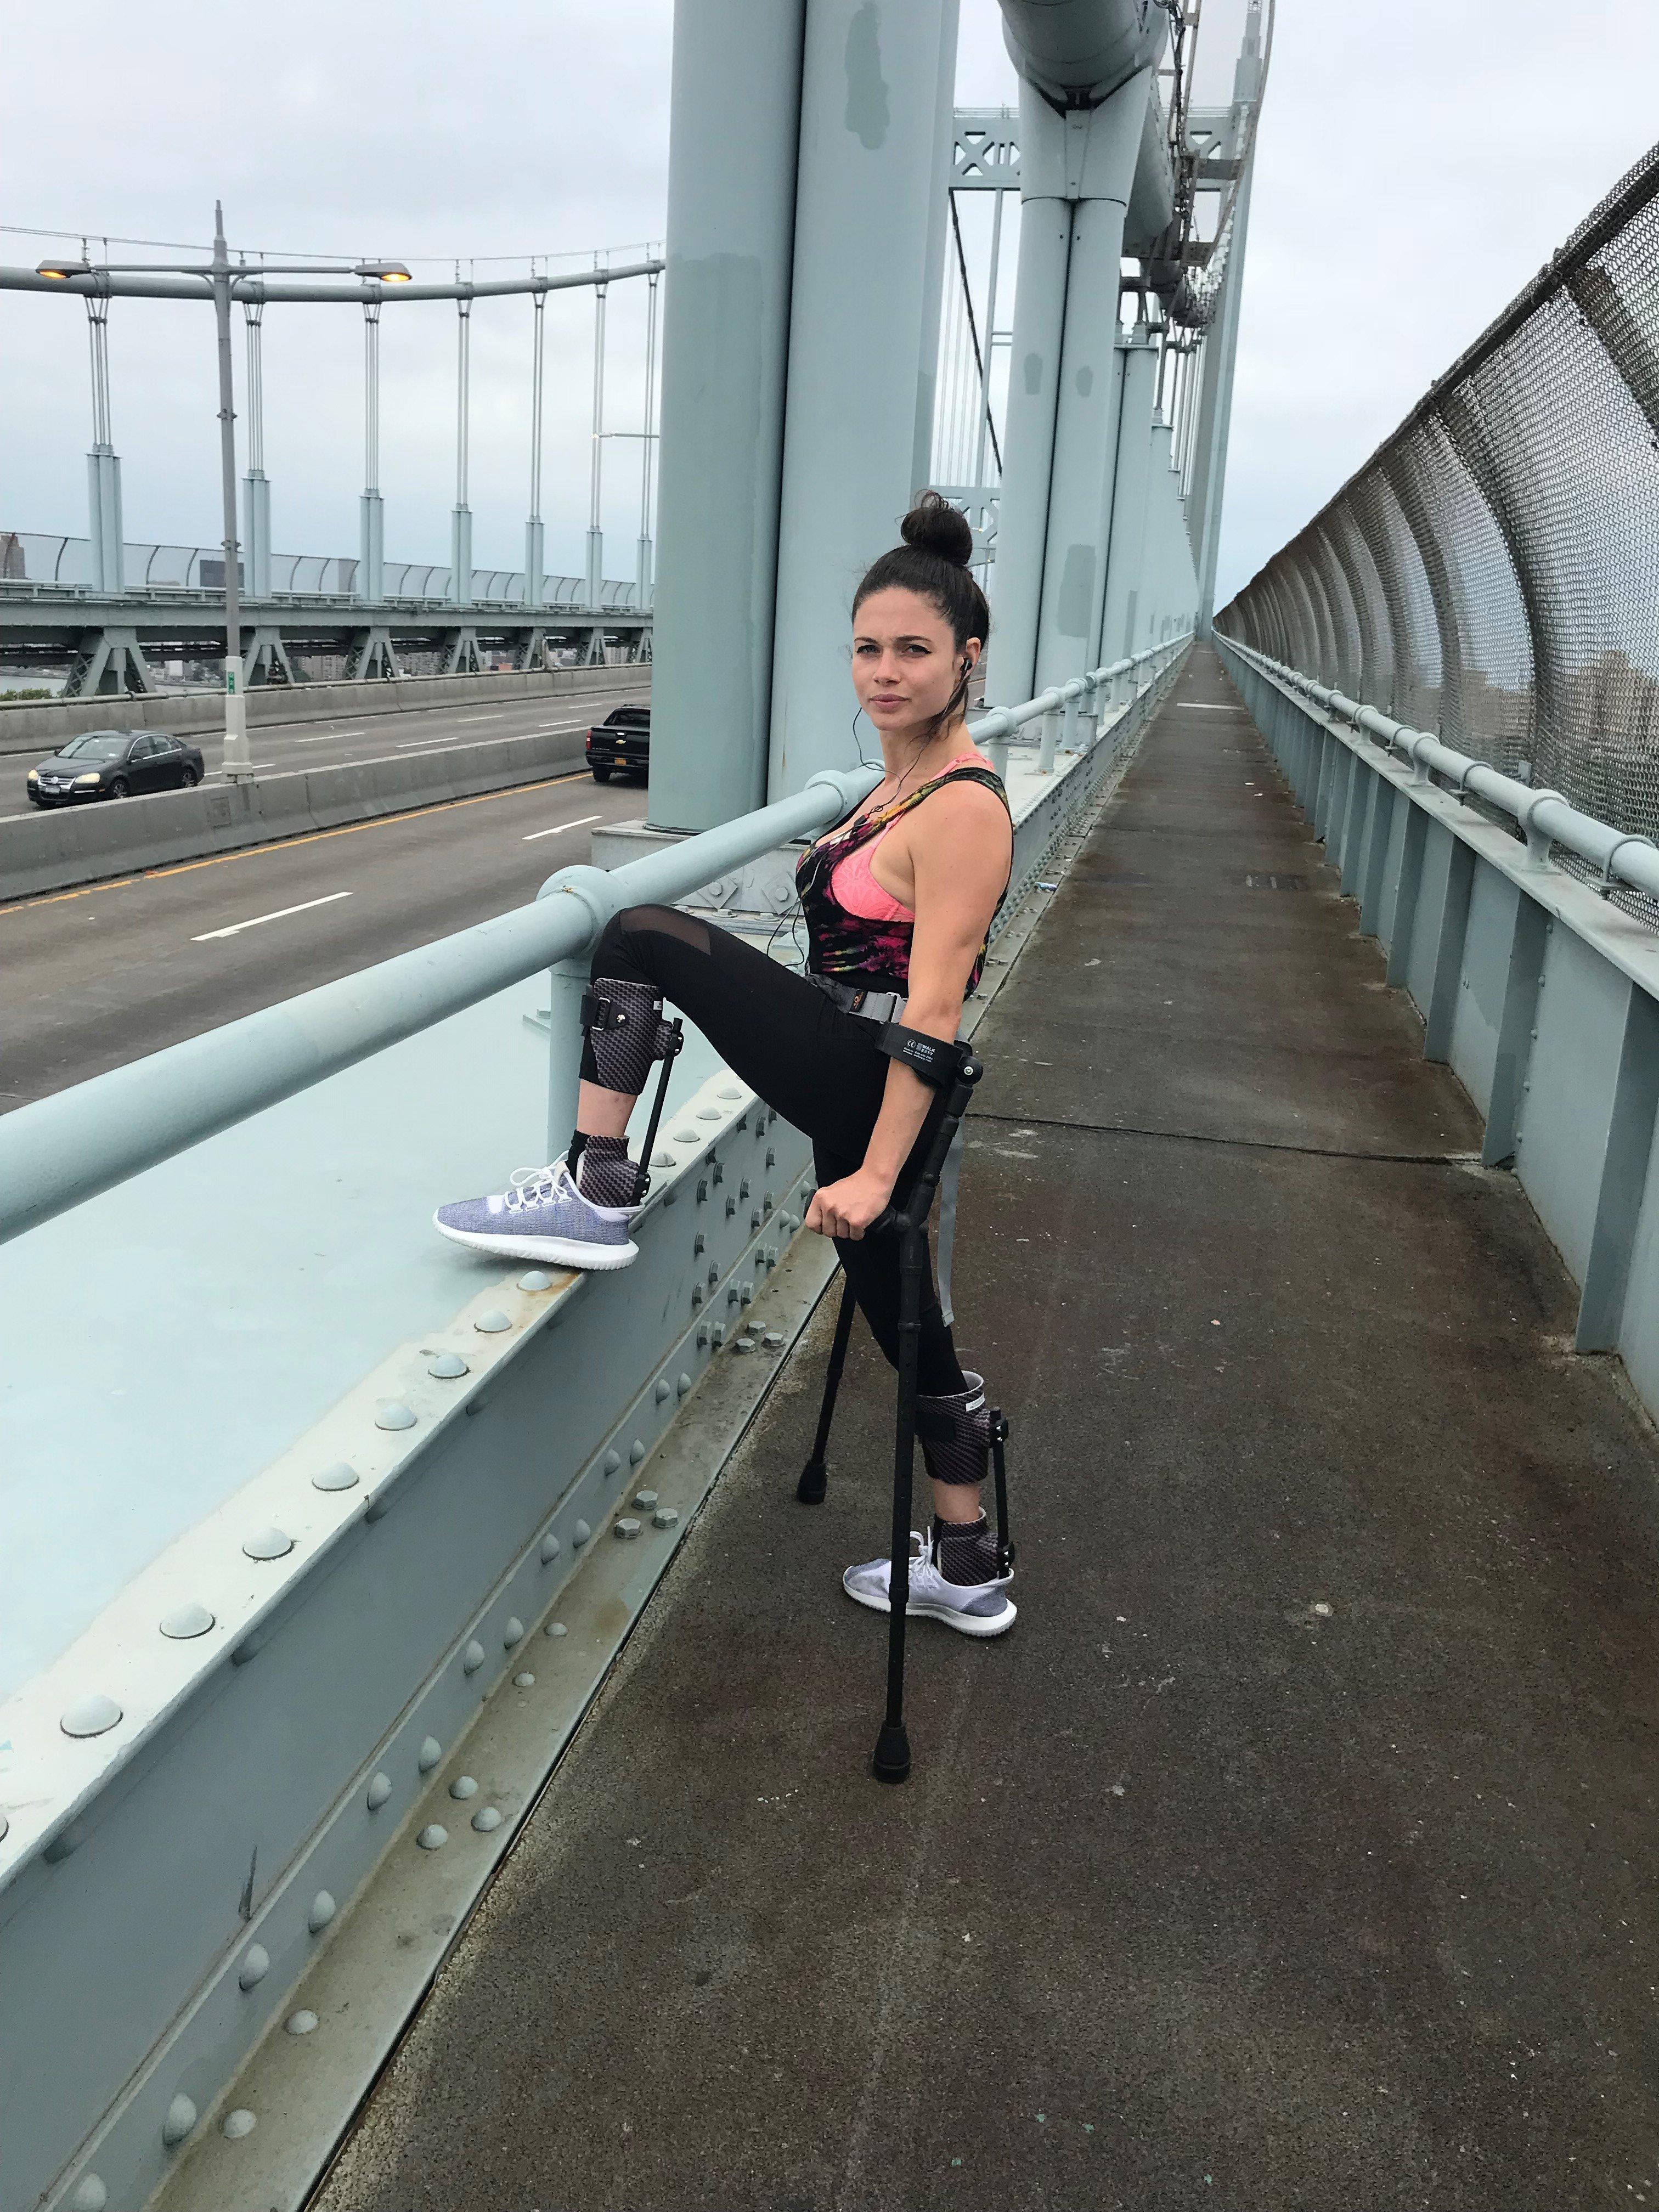 Hannah Gavios, a woman living with paralysis, will crutch the NYC Marathon on Nov. 4.